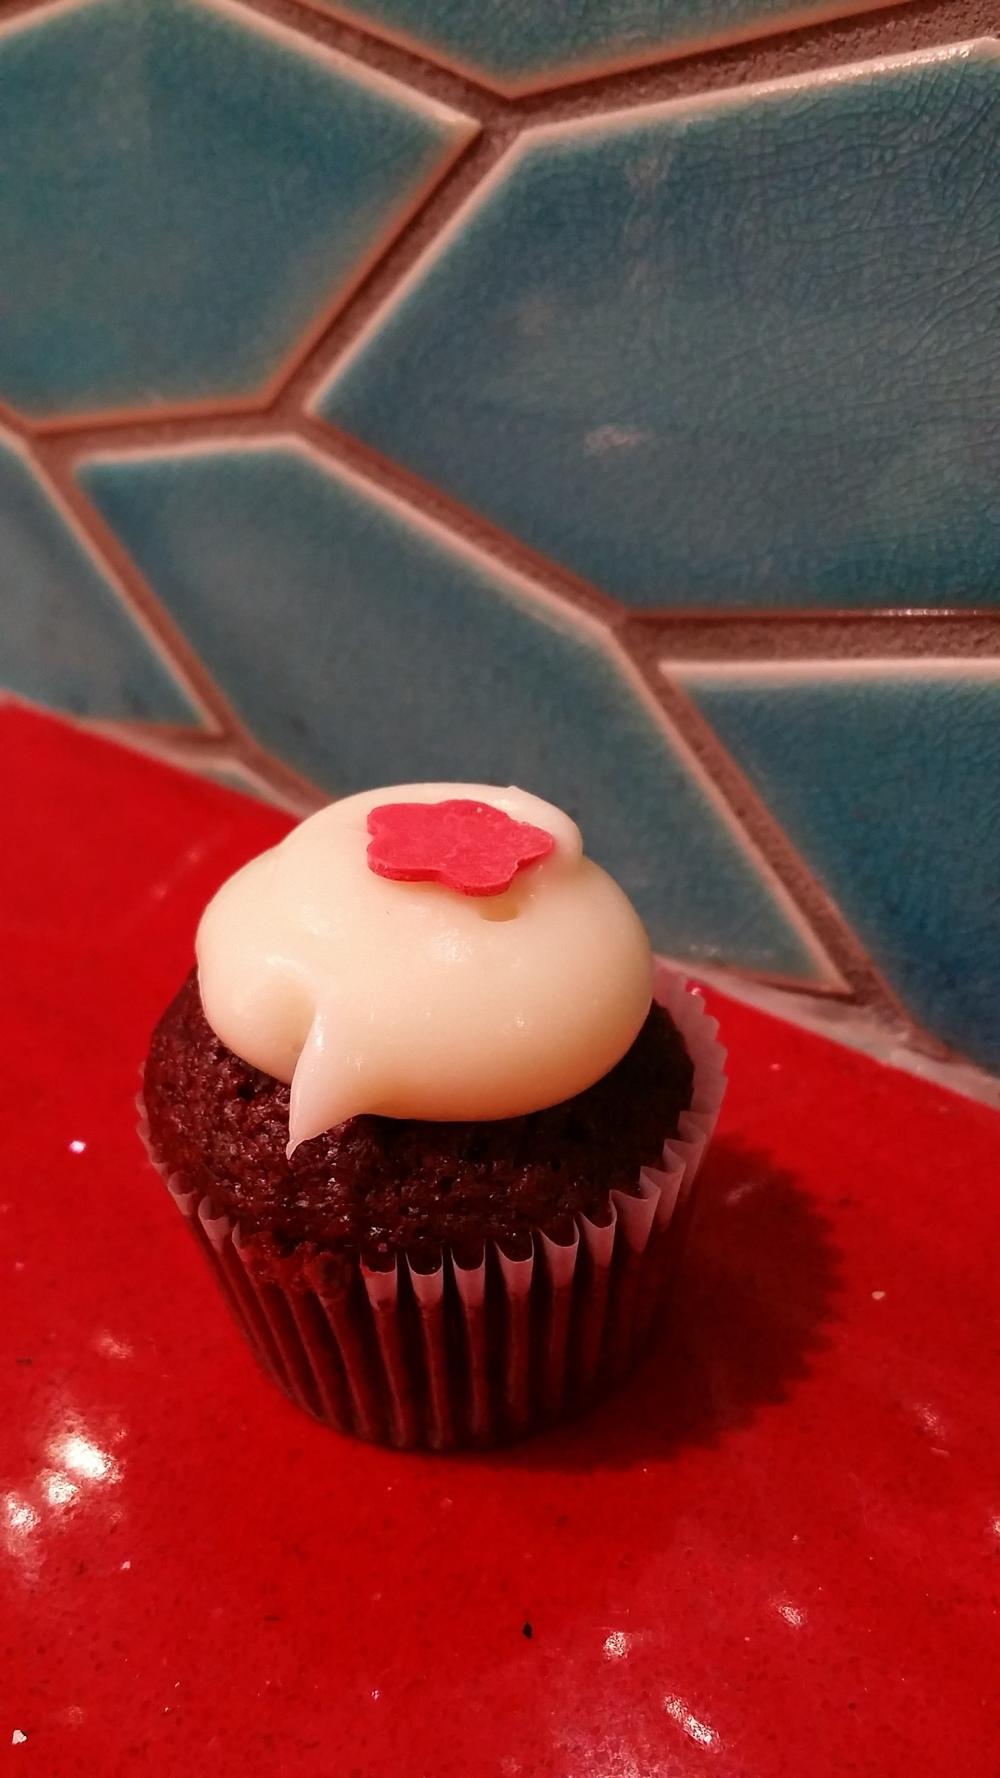 Cako Red Velvet Cupcake